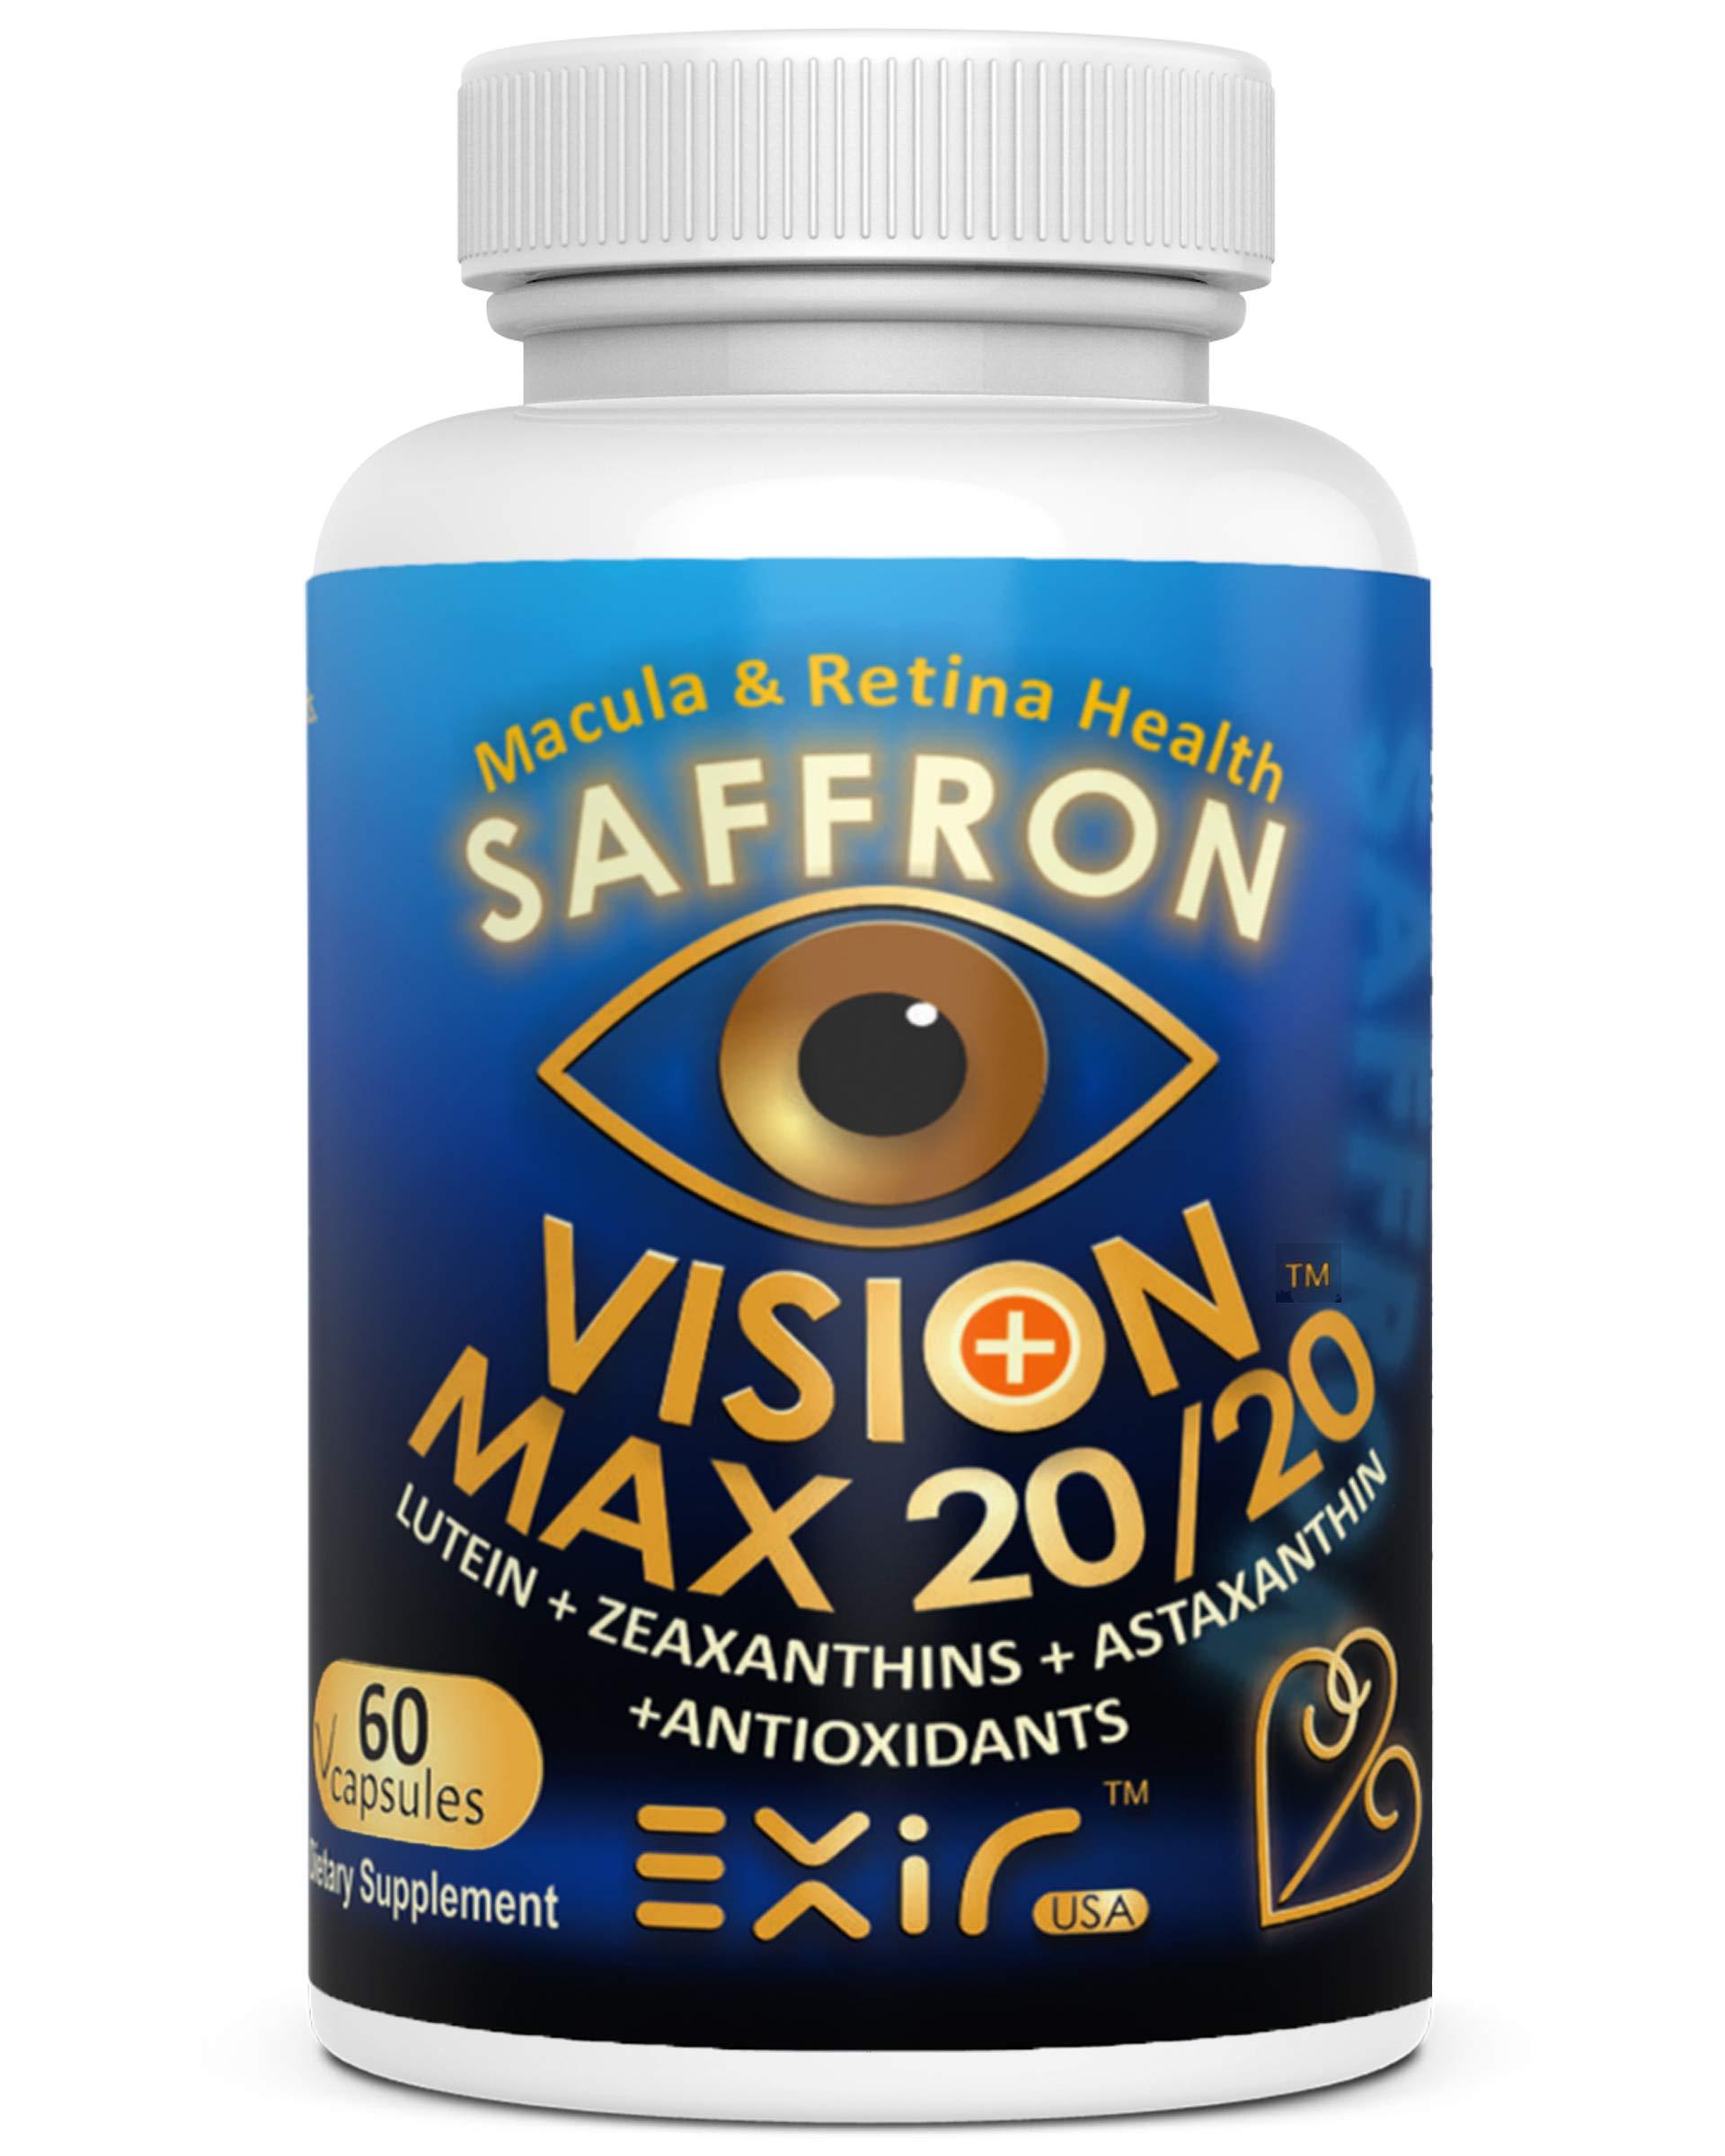 High Potency Saffron, Lutein, Meso-Zeaxanthin, Zeaxanthin, Astaxanthin, Proanthocyanidins, Curcuminoids, 60 Capsules by EXIR